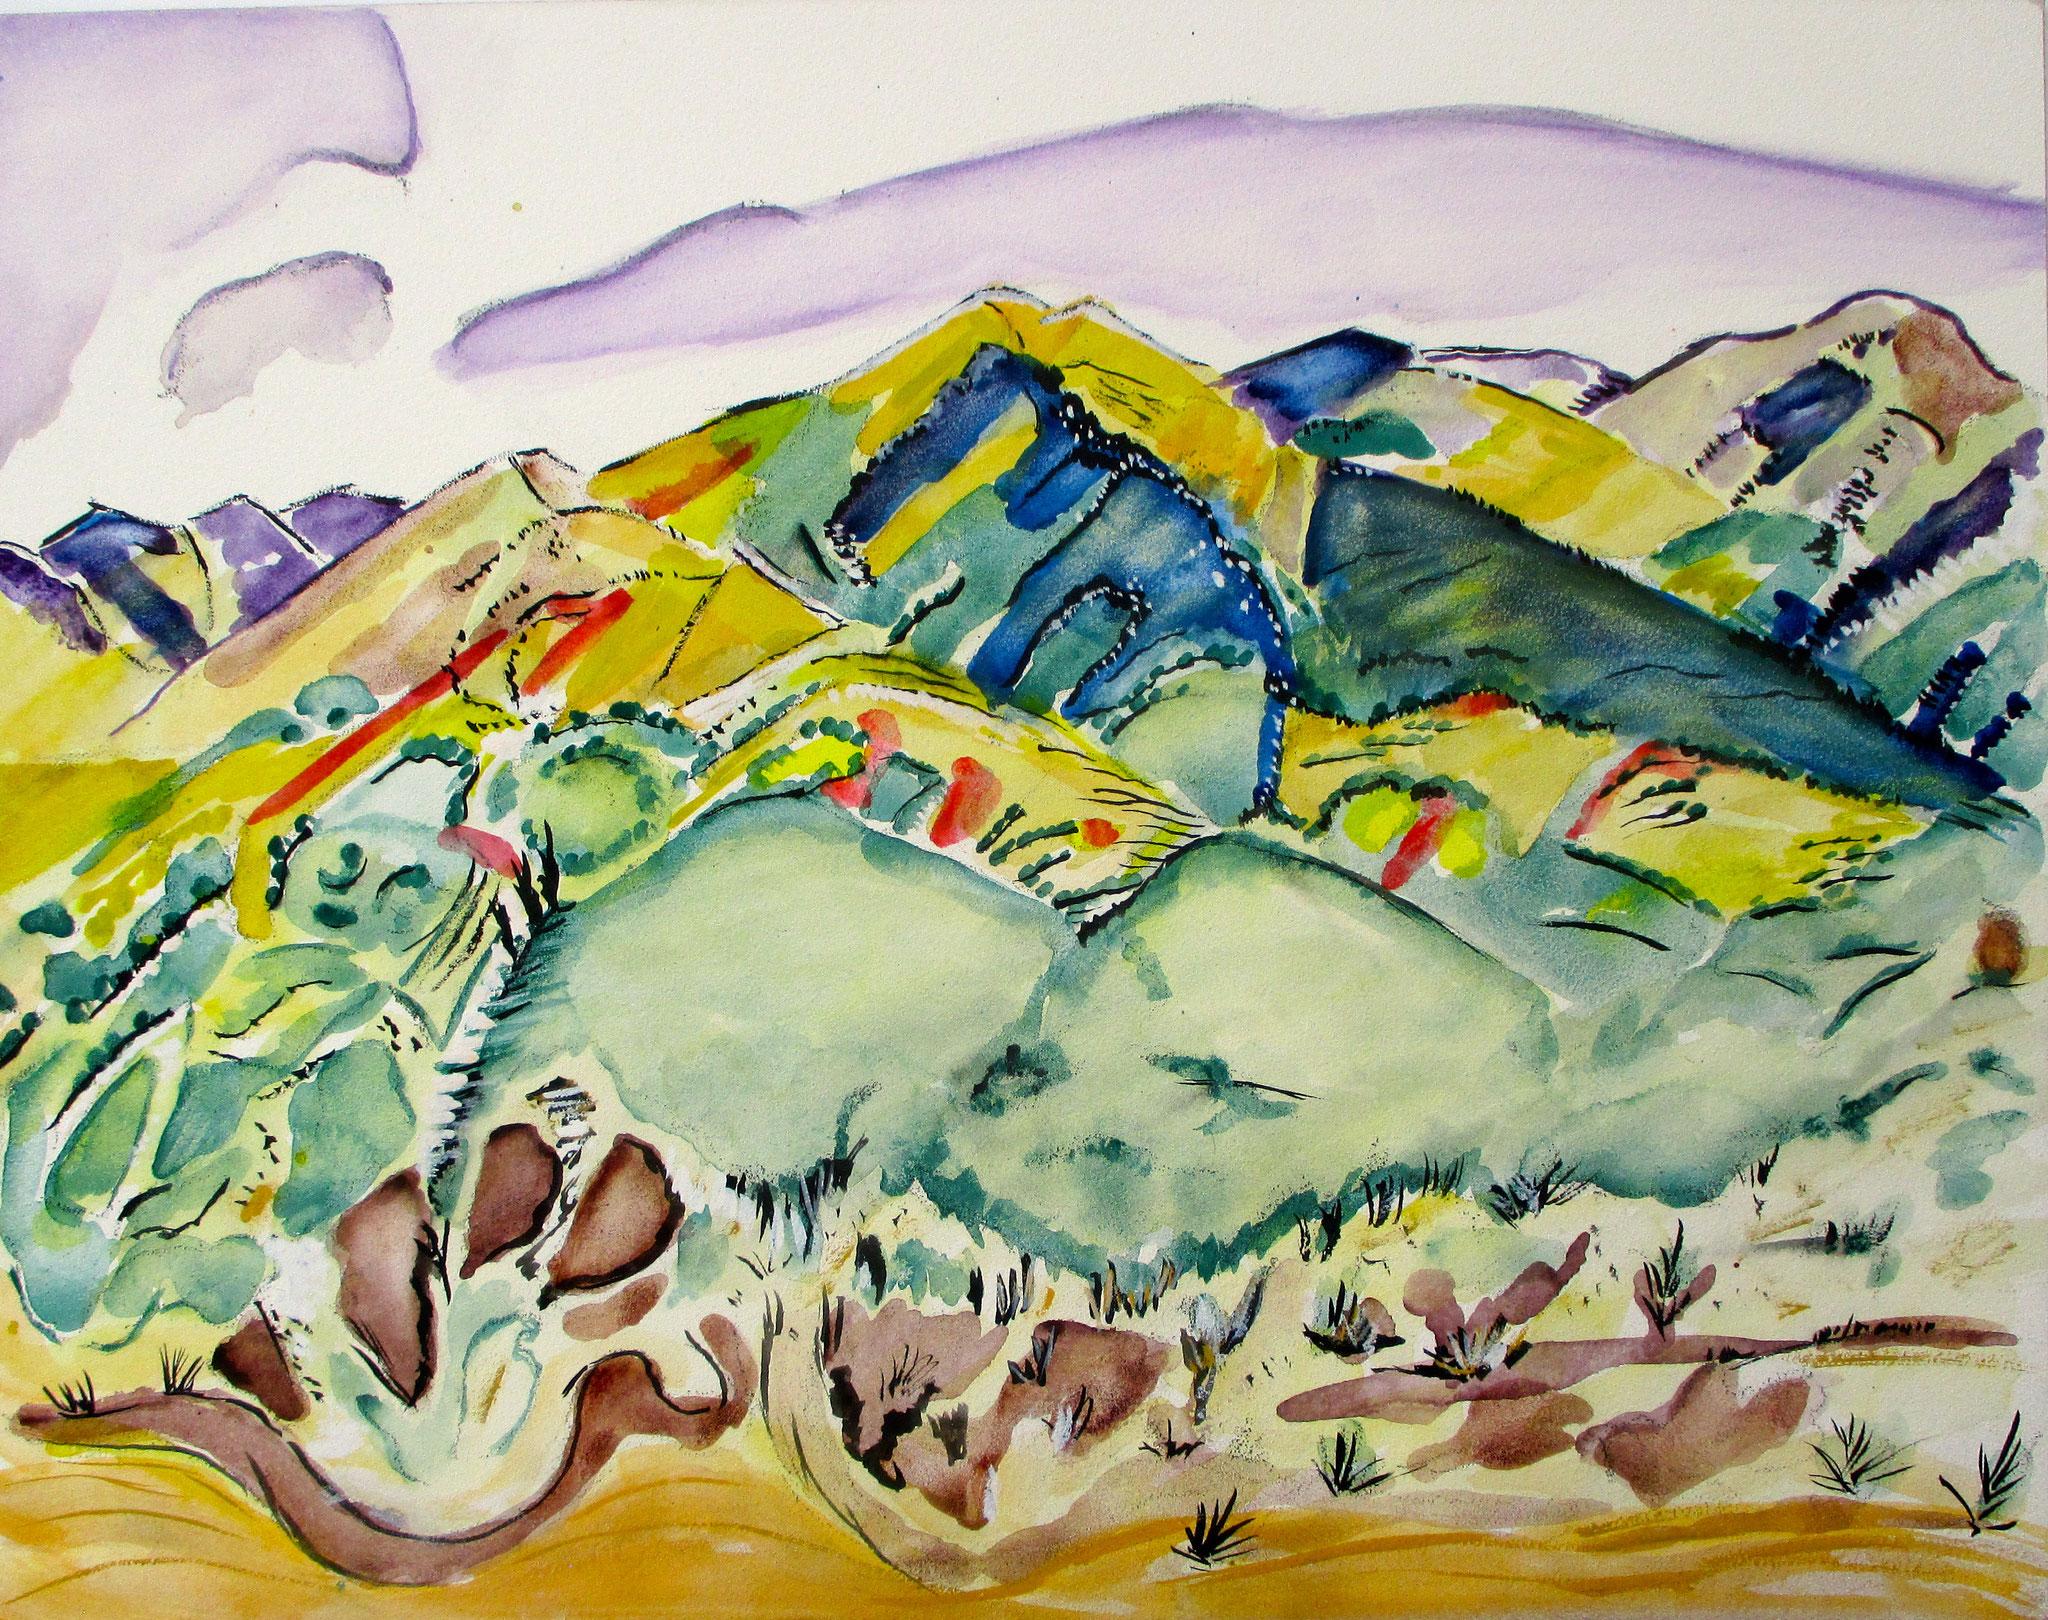 Summer Solstice, watercolor on board, 14 x 11